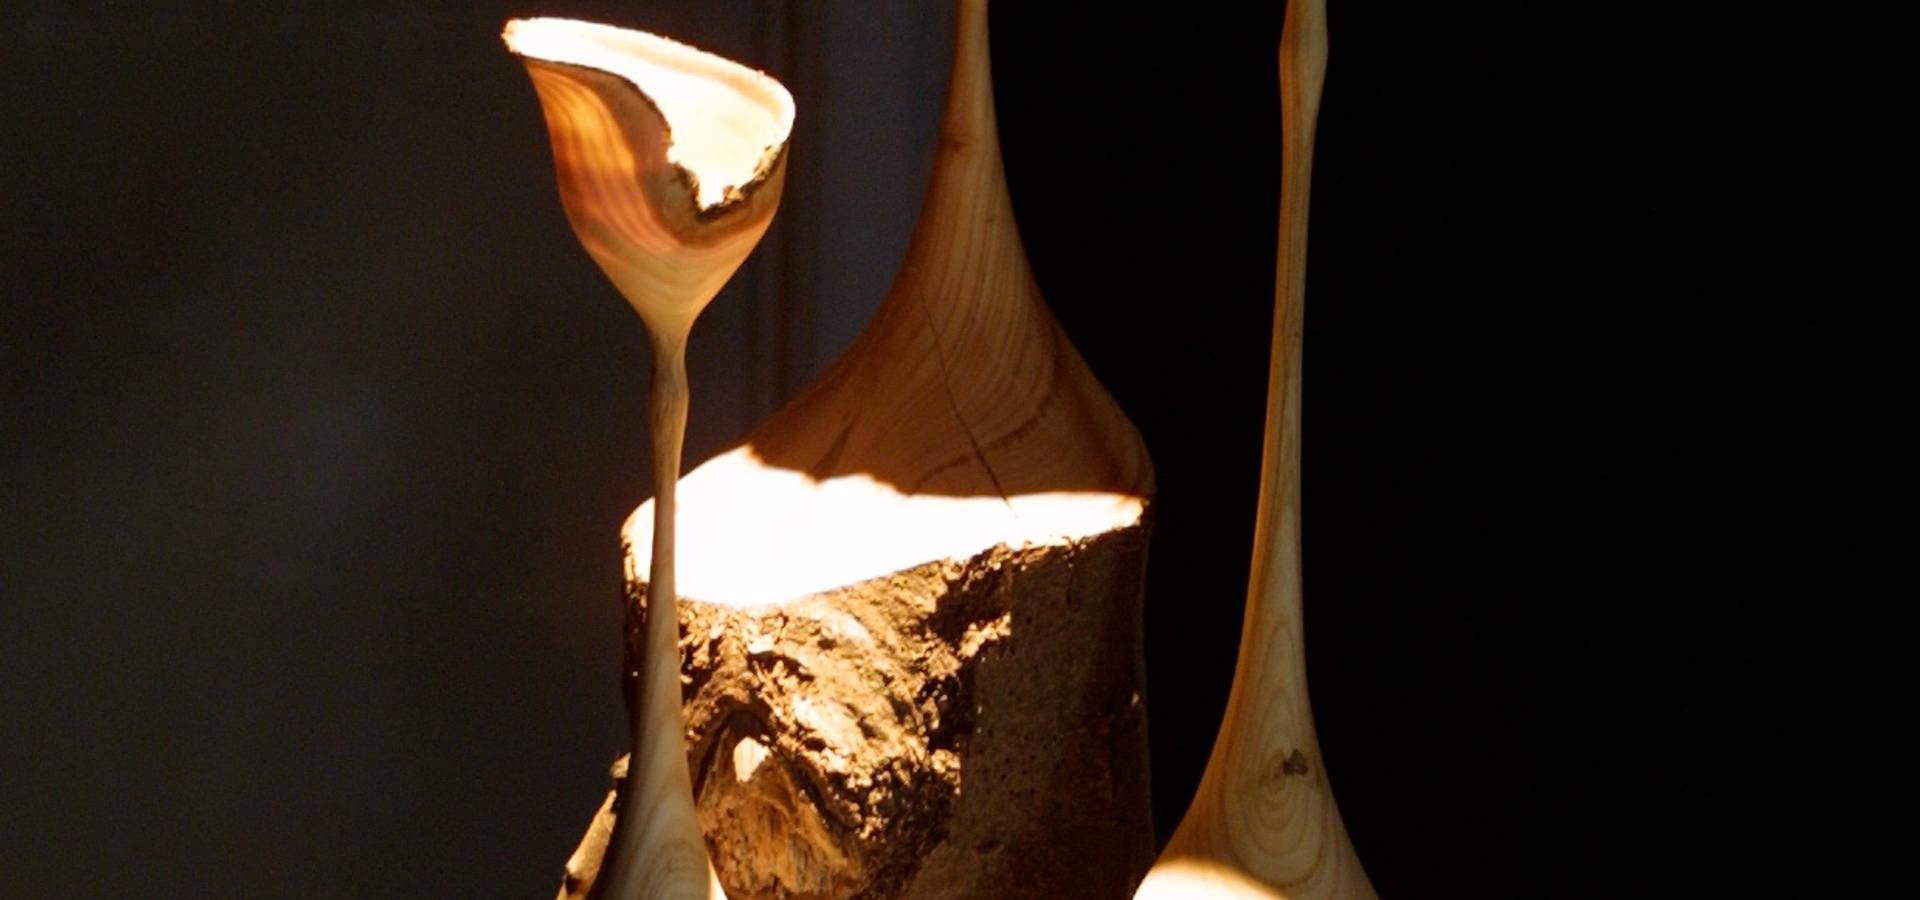 lichtobjekte aus holz by christian masche holz design skulptur homify. Black Bedroom Furniture Sets. Home Design Ideas